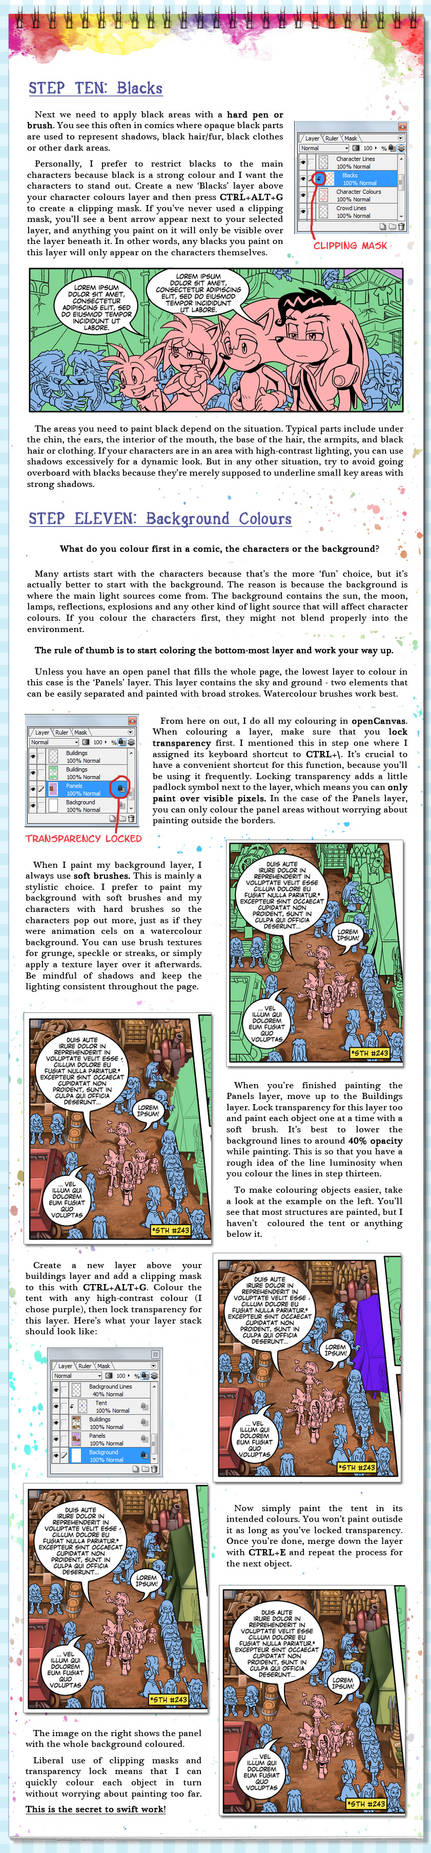 Comic Page Tutorial - Steps 10-11